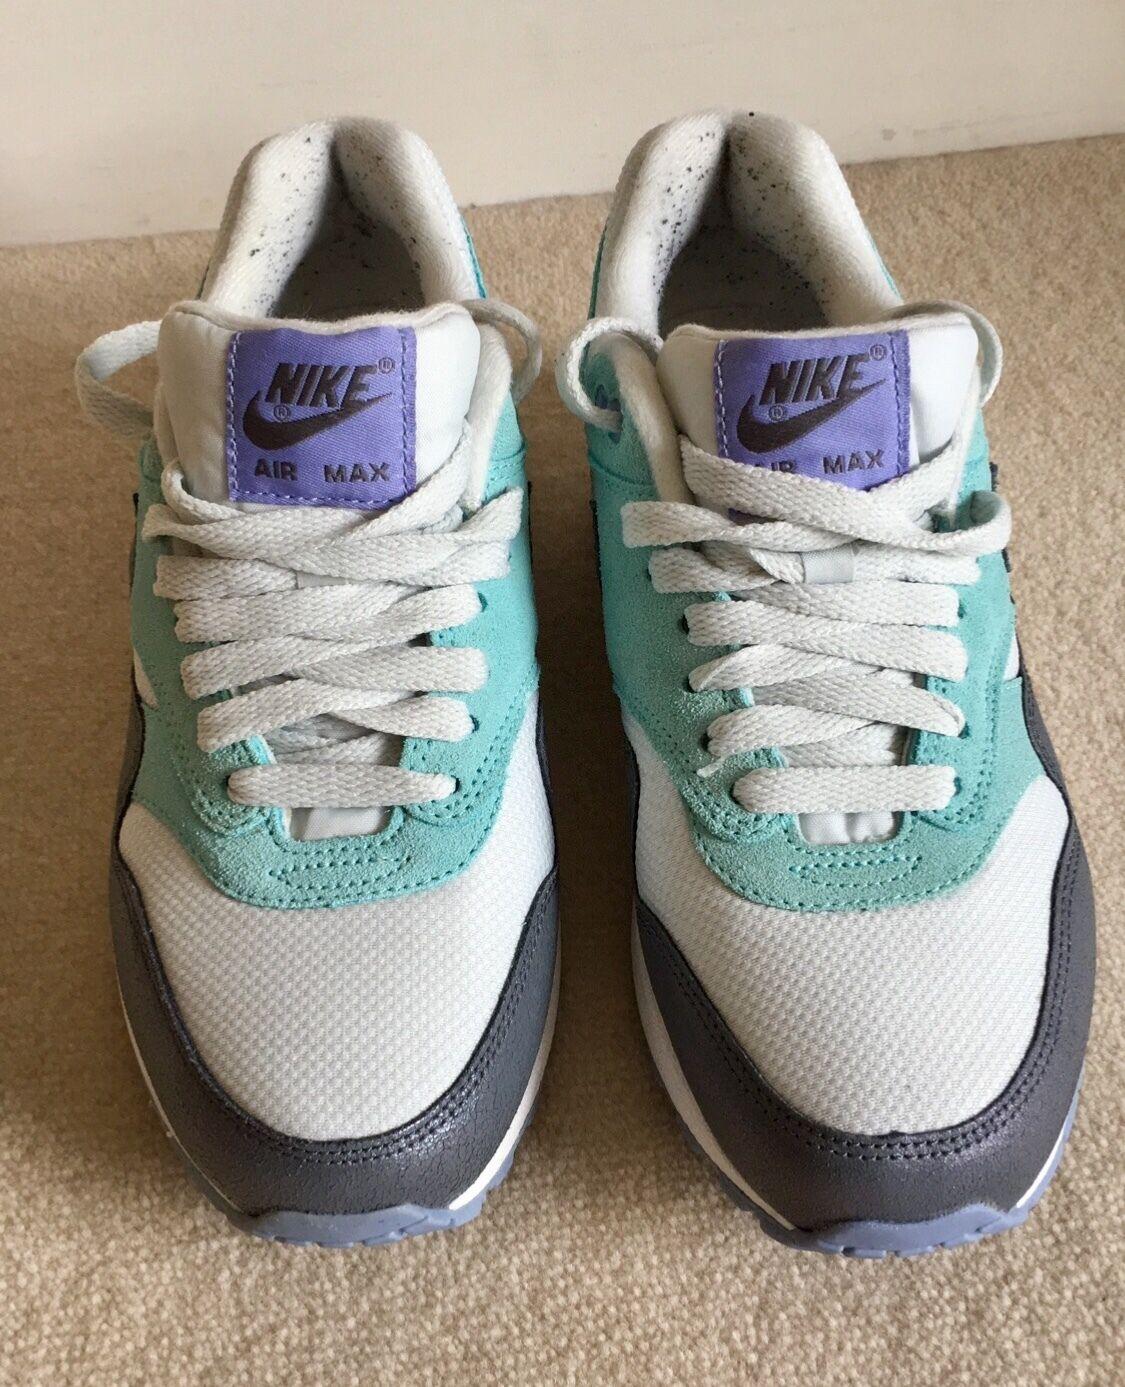 Nike air max dimensione aqua 4